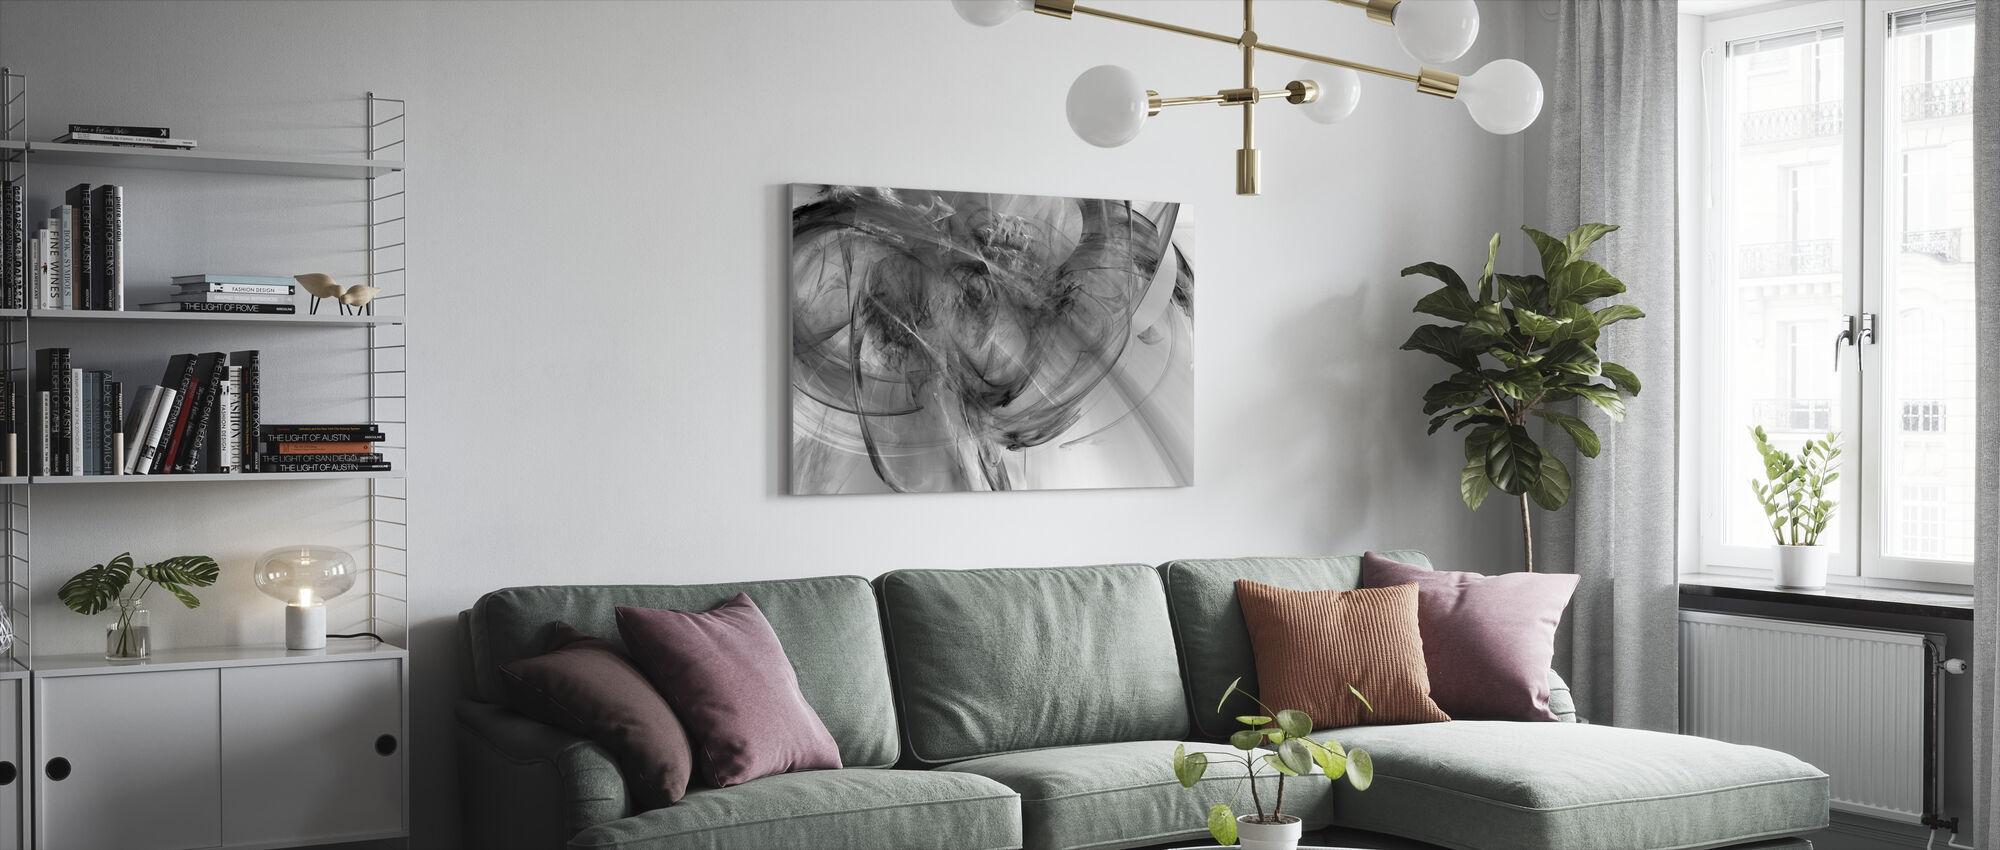 Rosa hytte - Lerretsbilde - Stue